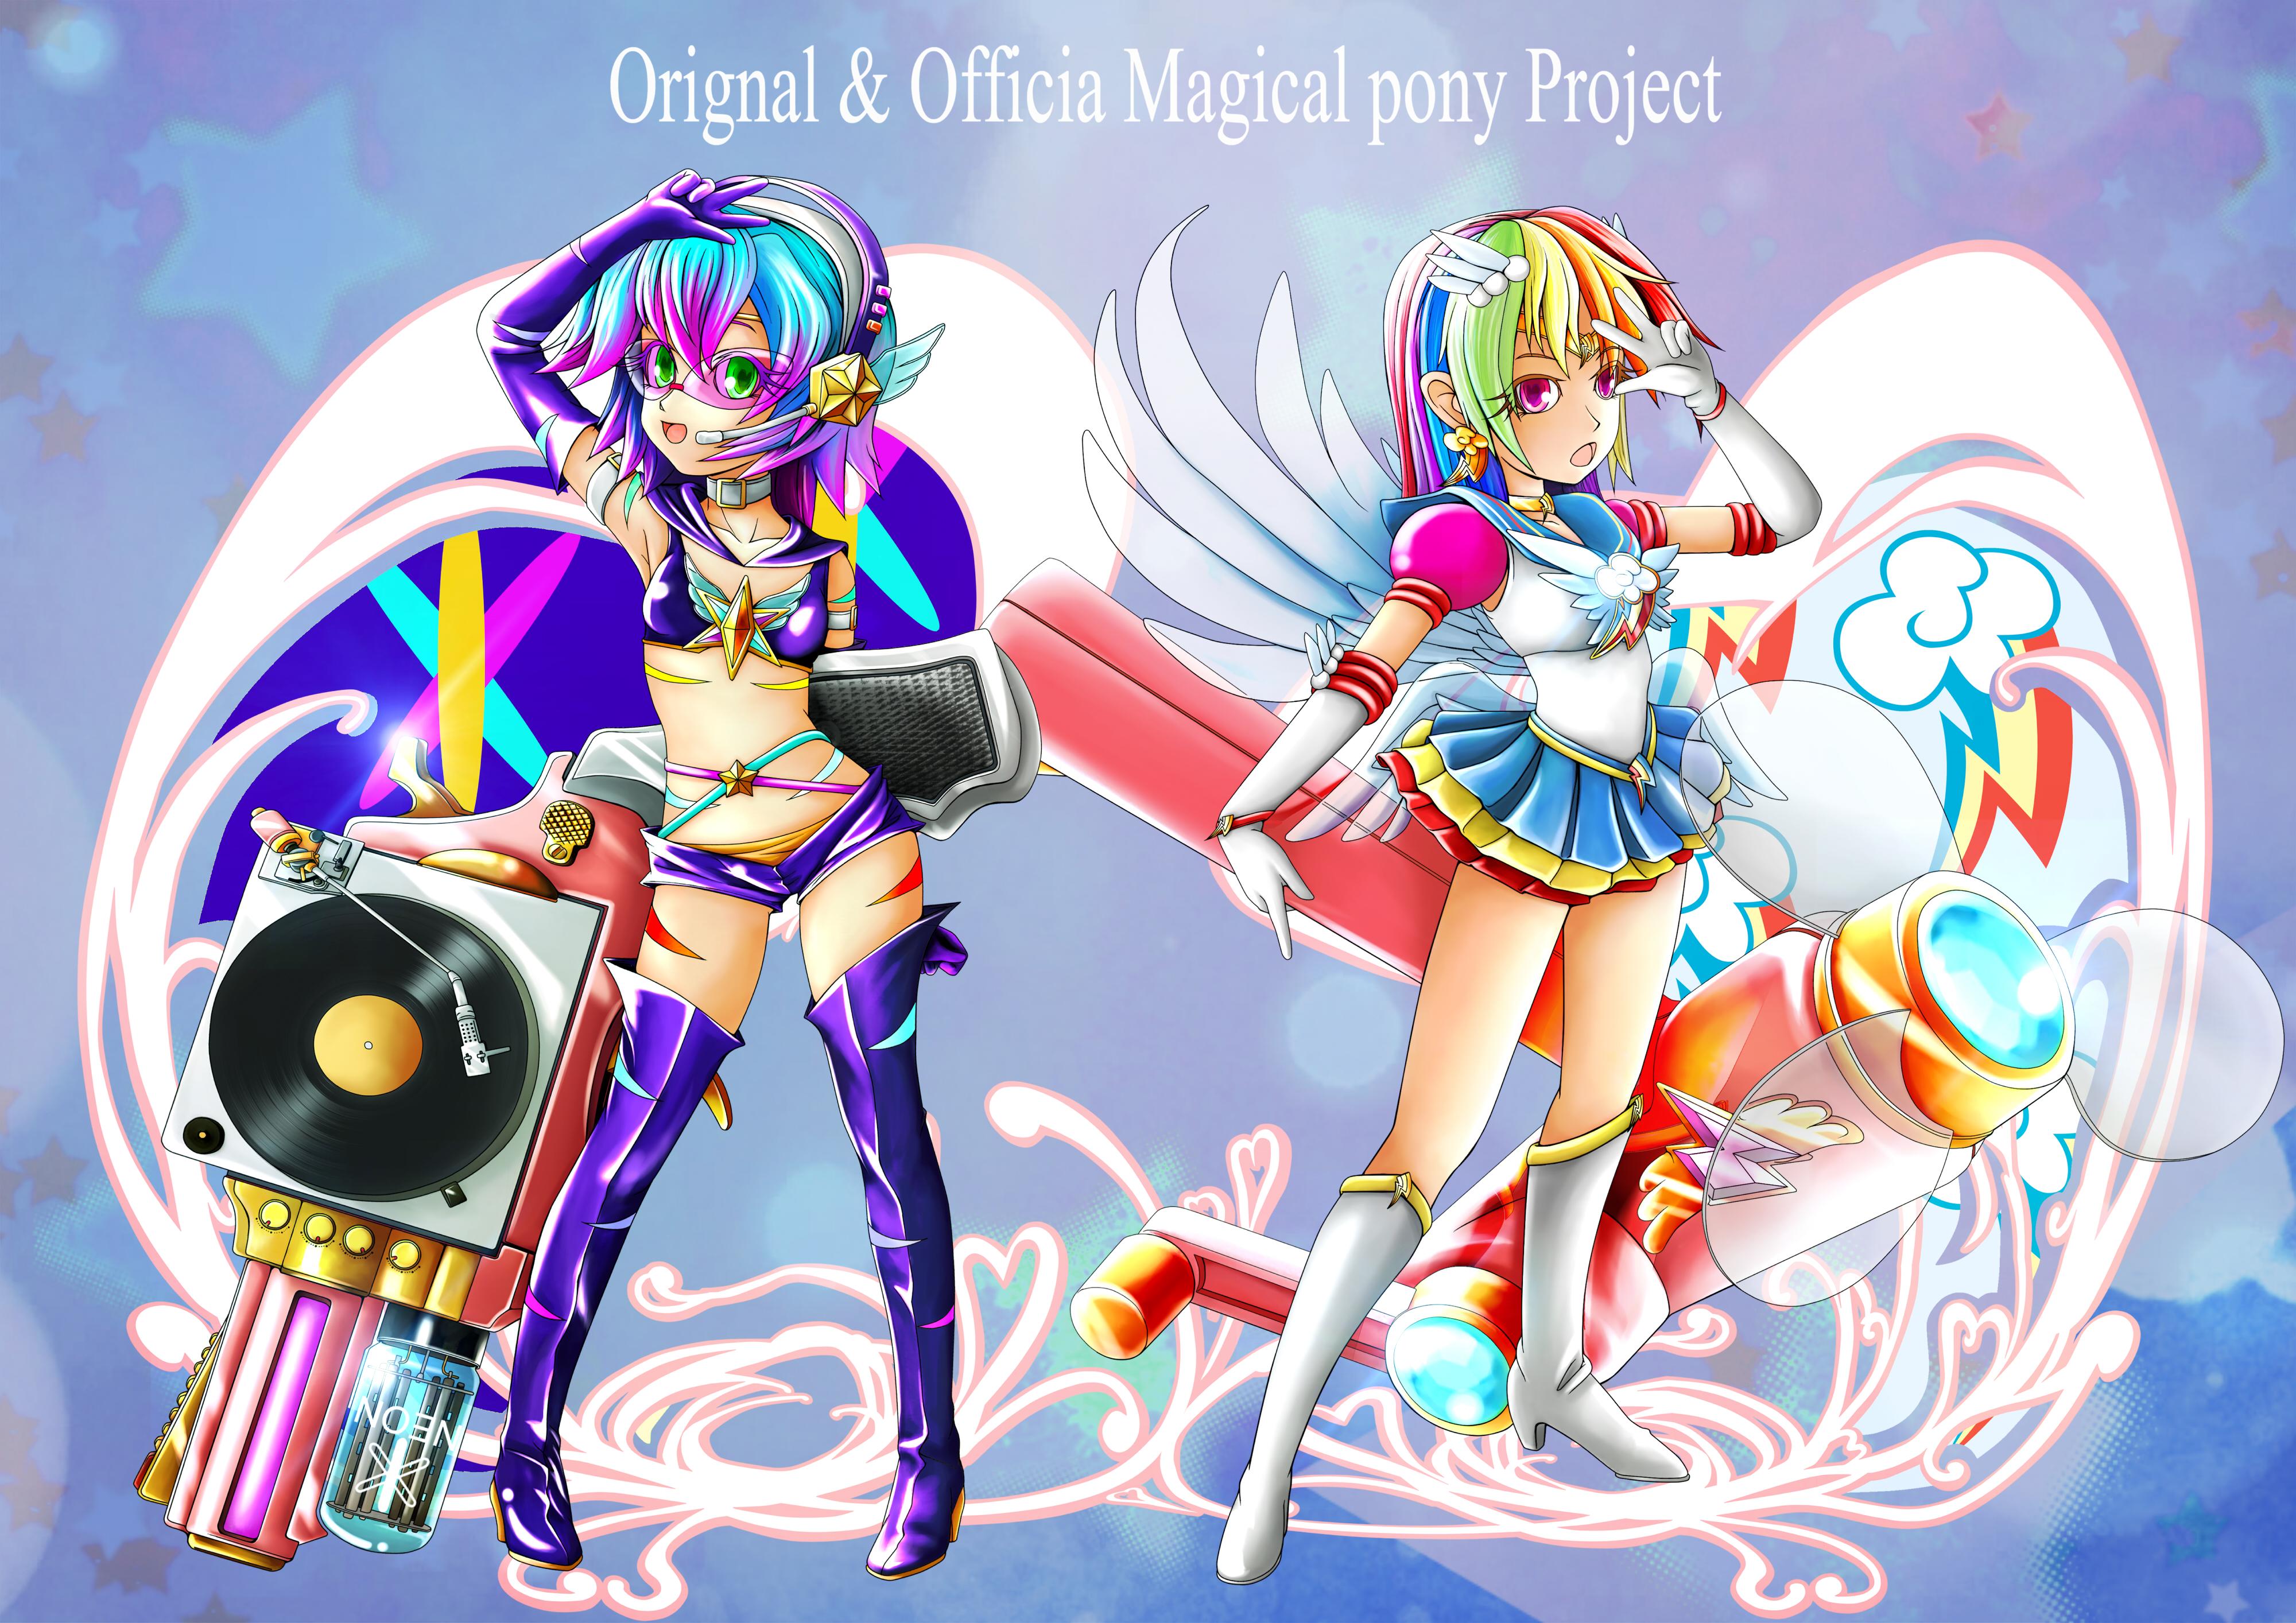 Magical mlp Rainbow Dash oc Neon (Human) by skyshek